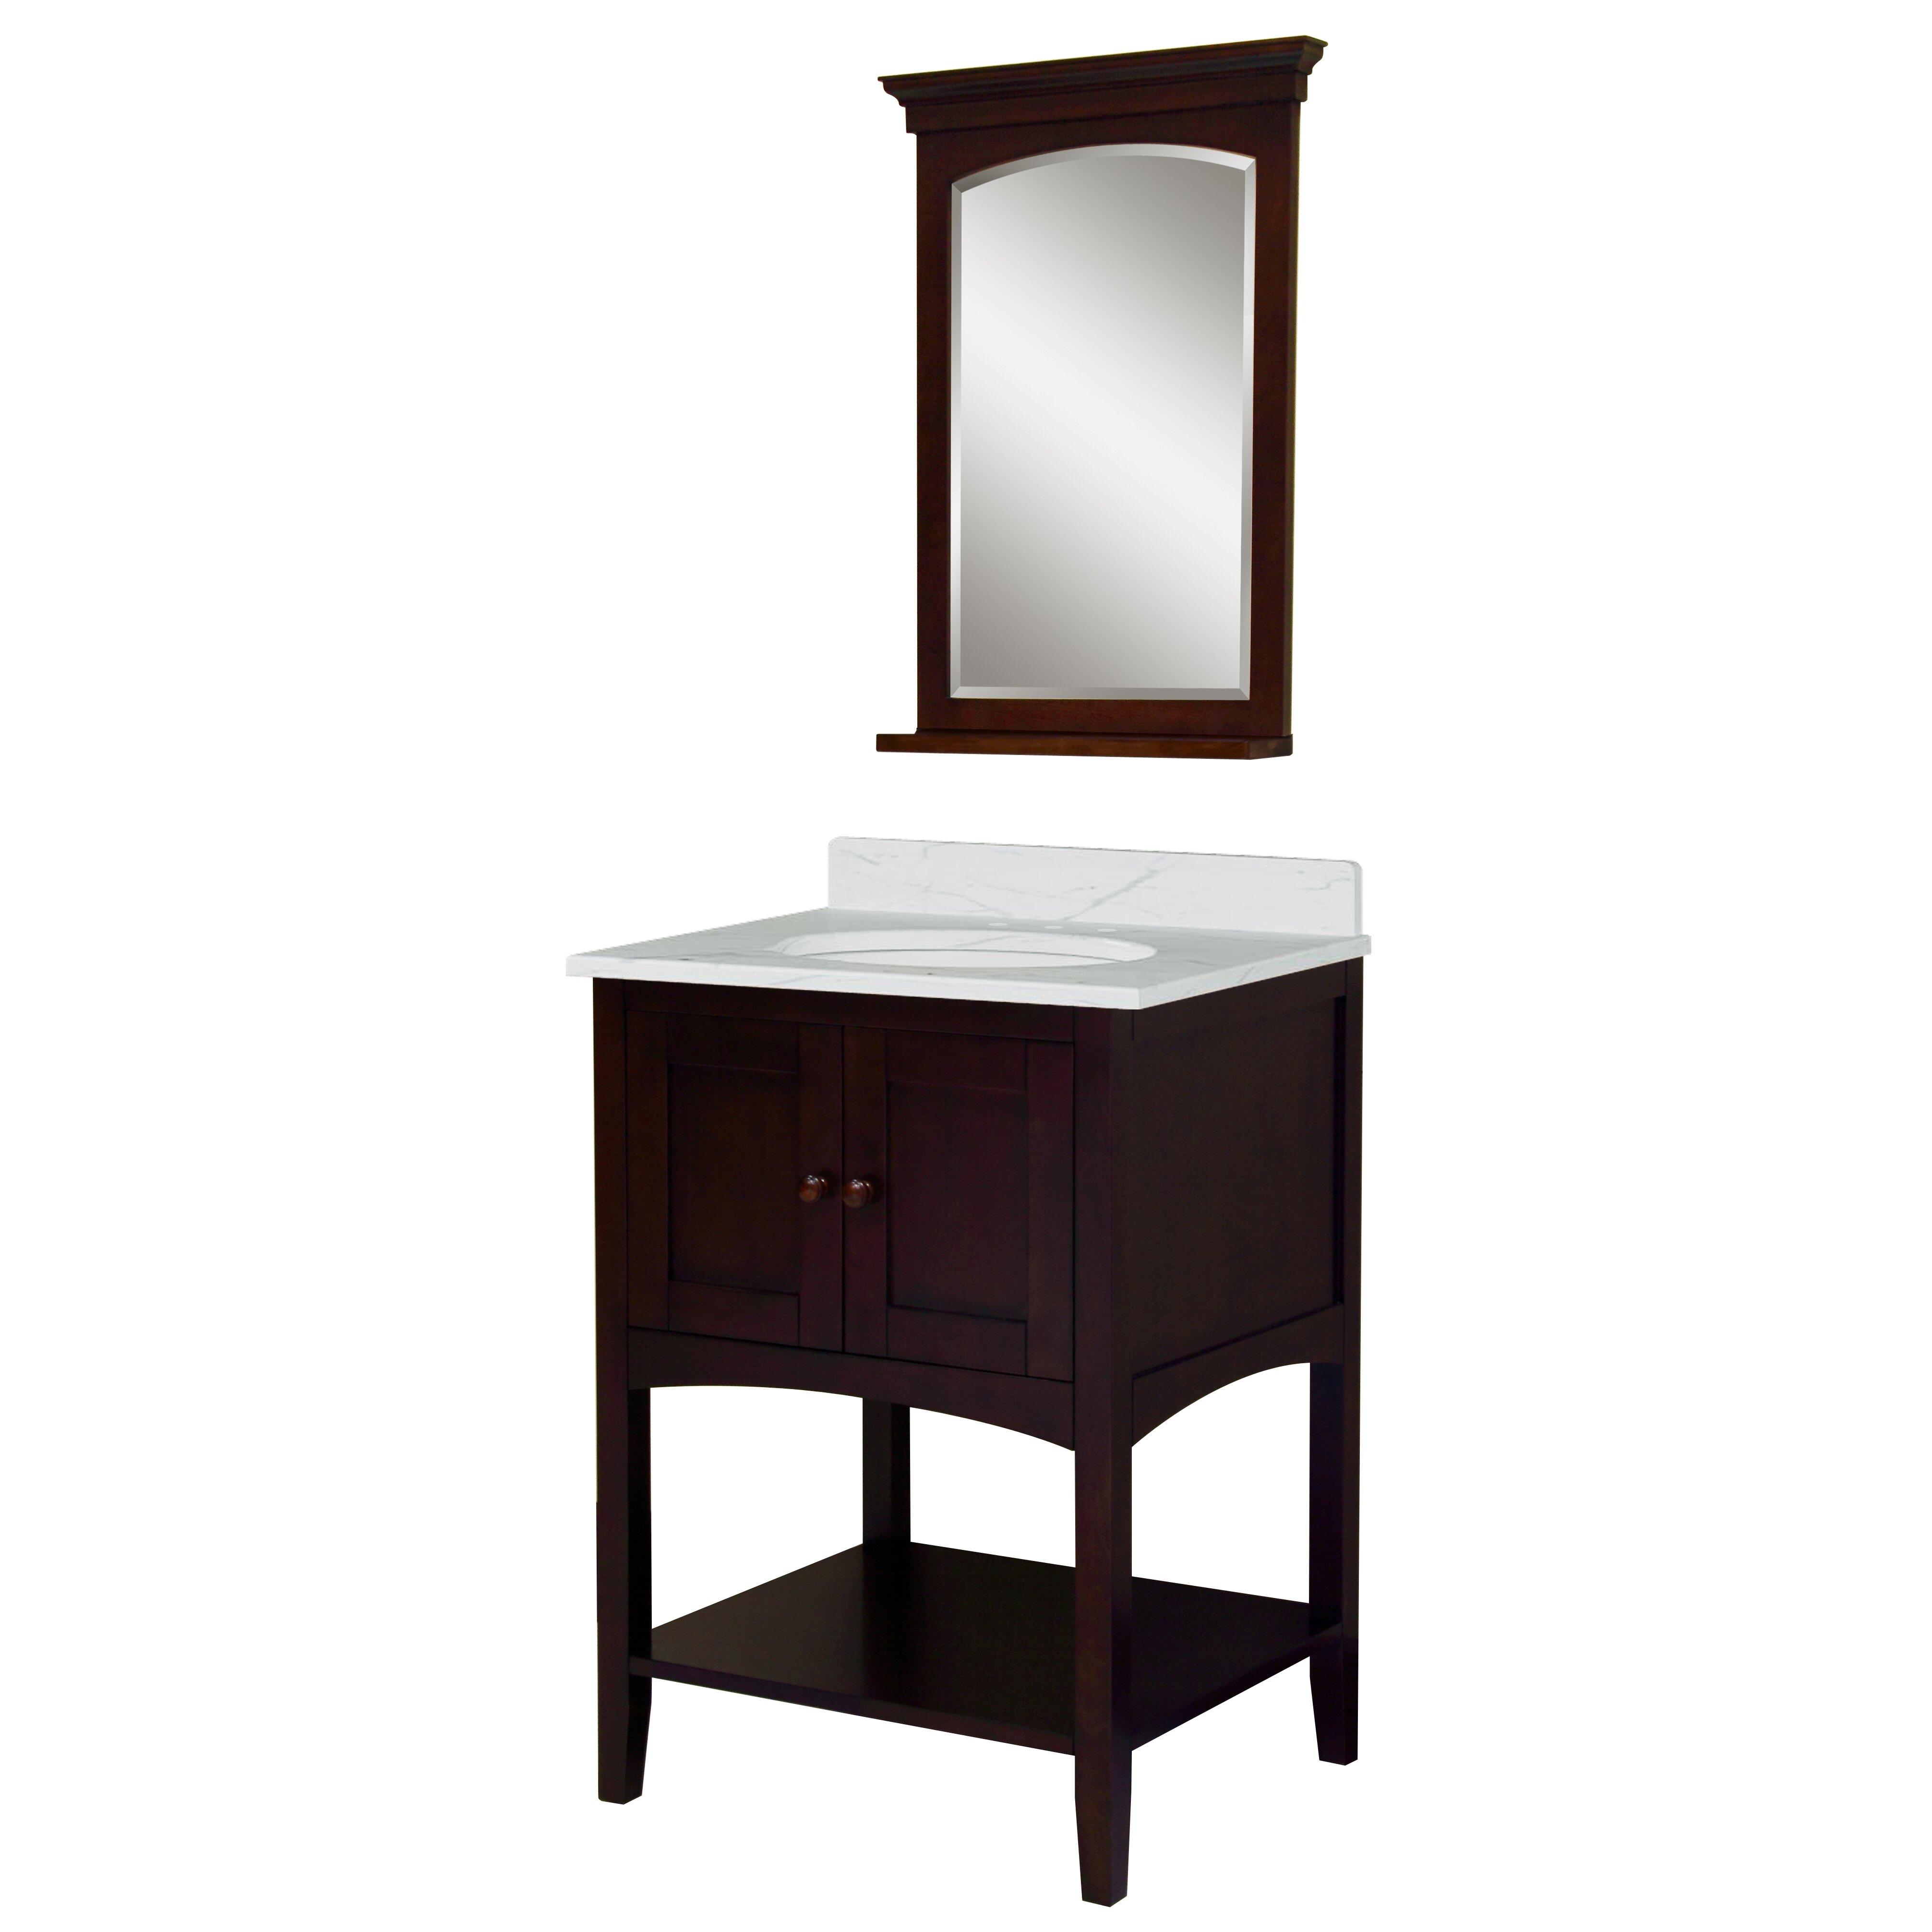 "Sagehill Allure 24"" Bathroom Vanity Base | Wayfair"